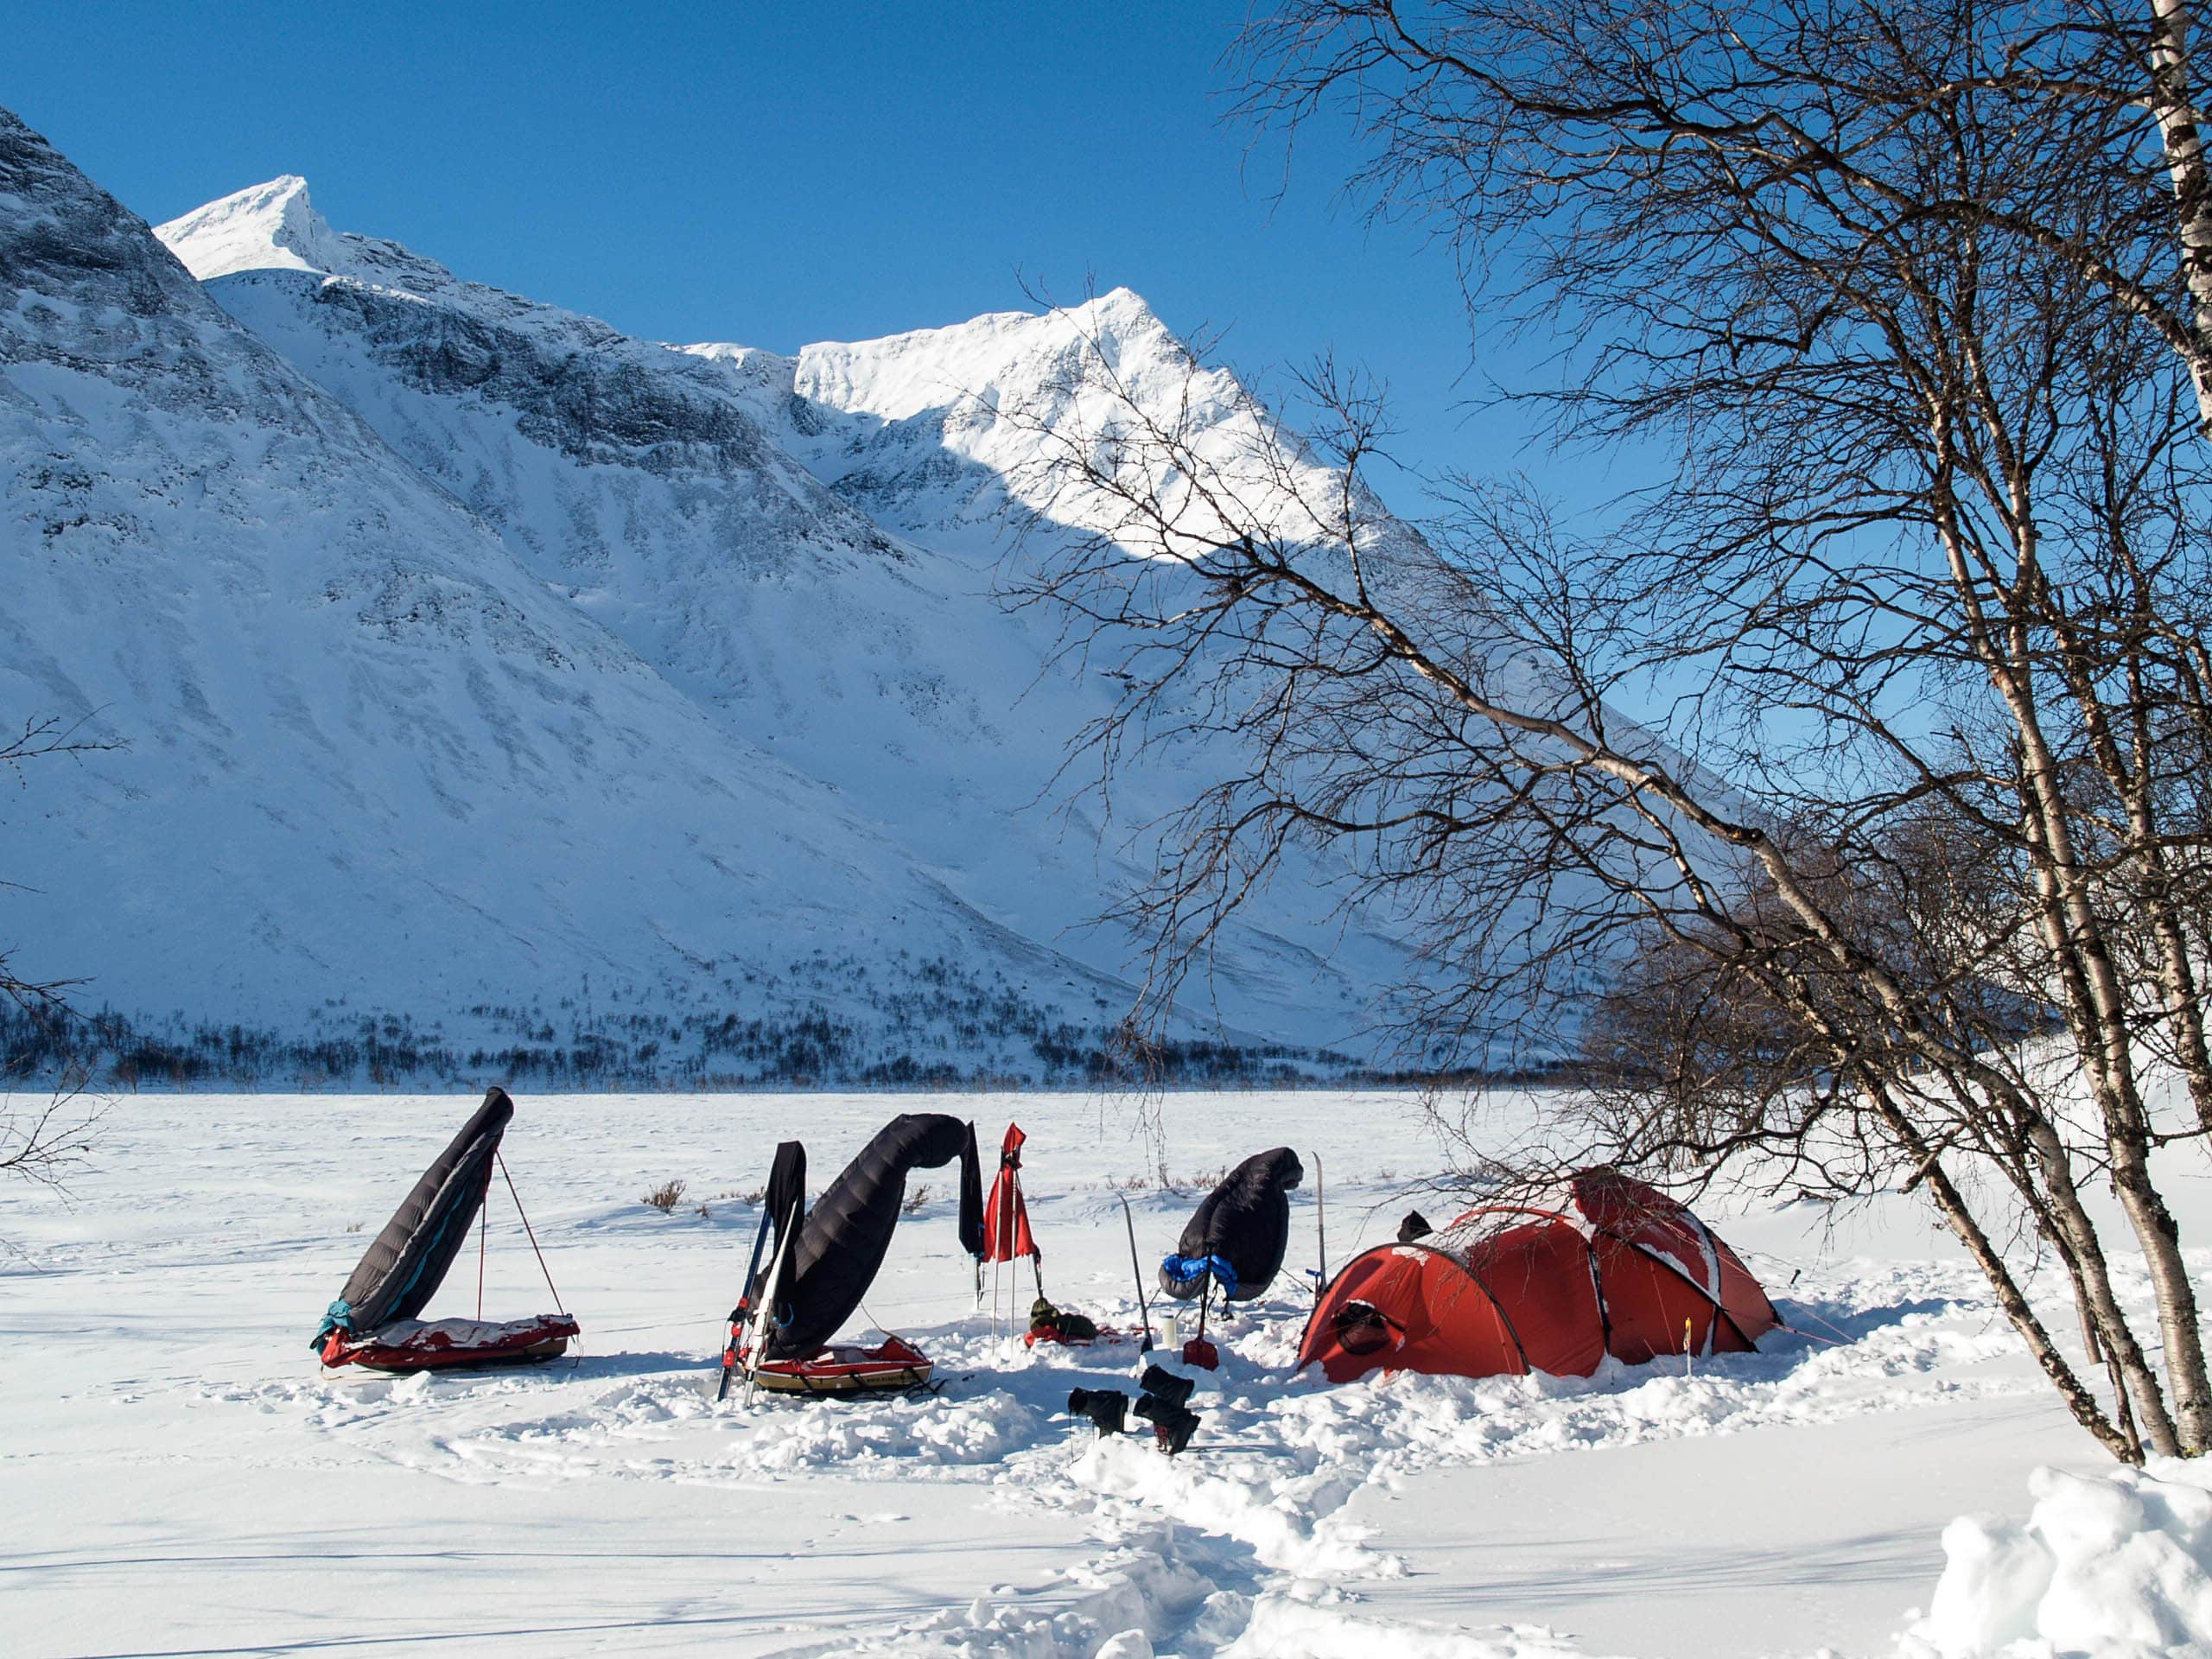 Immer schön den Schlafsack lüften! Foto: Wintertour Micha, Joh, Matthias